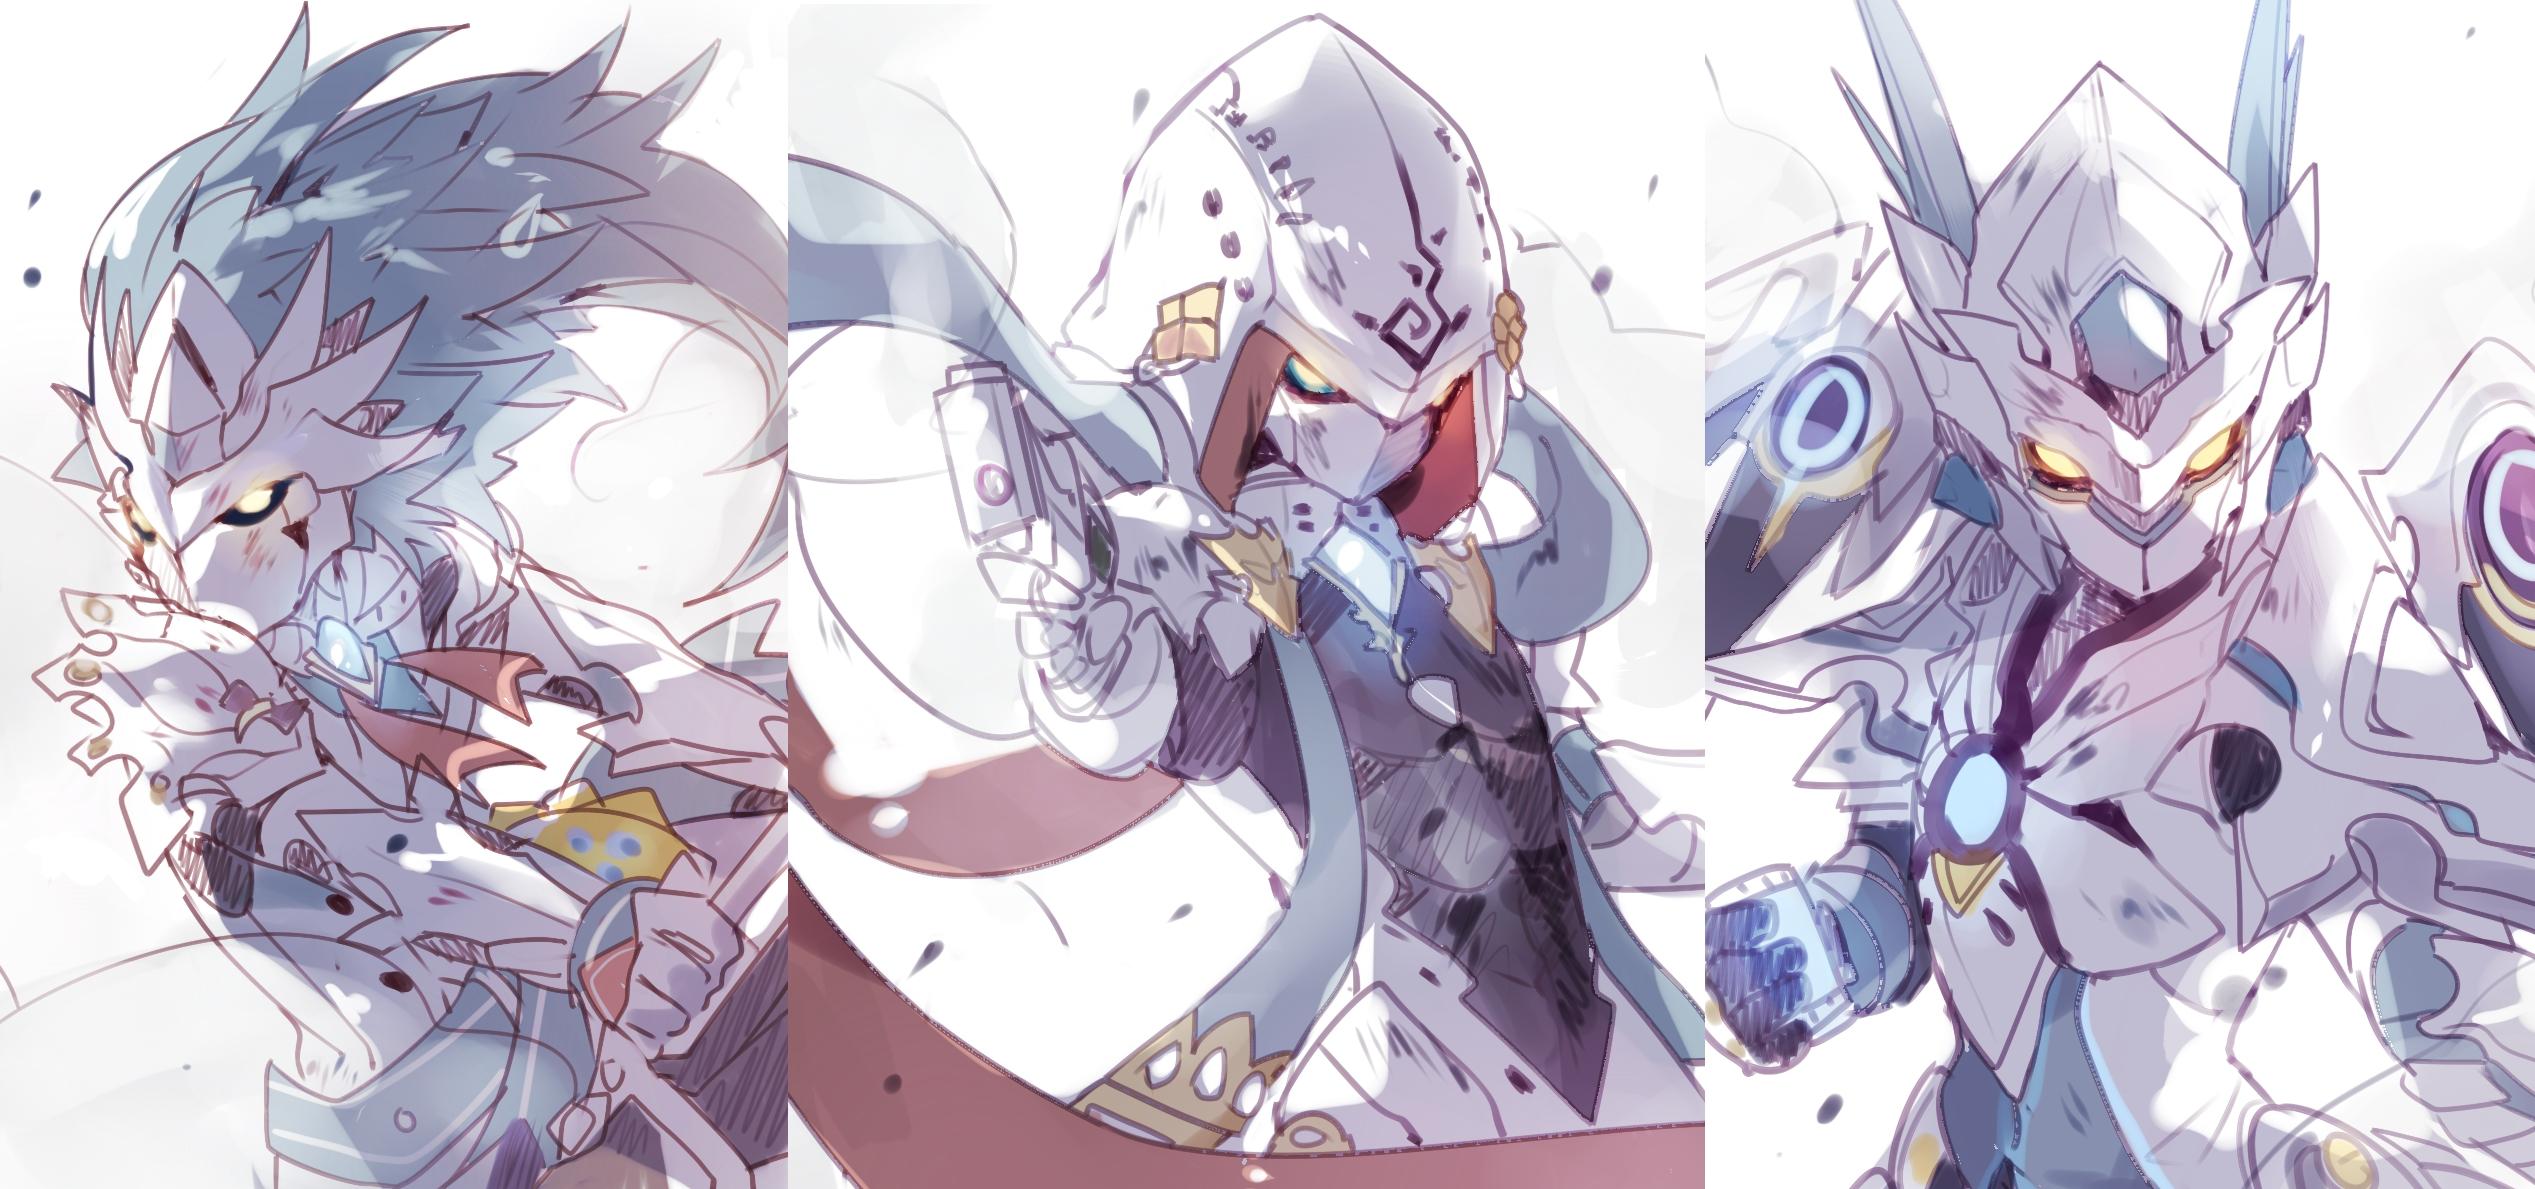 Iron Paladin Chung   Chung Elsword   Zerochan Anime Image Board 2535x1189